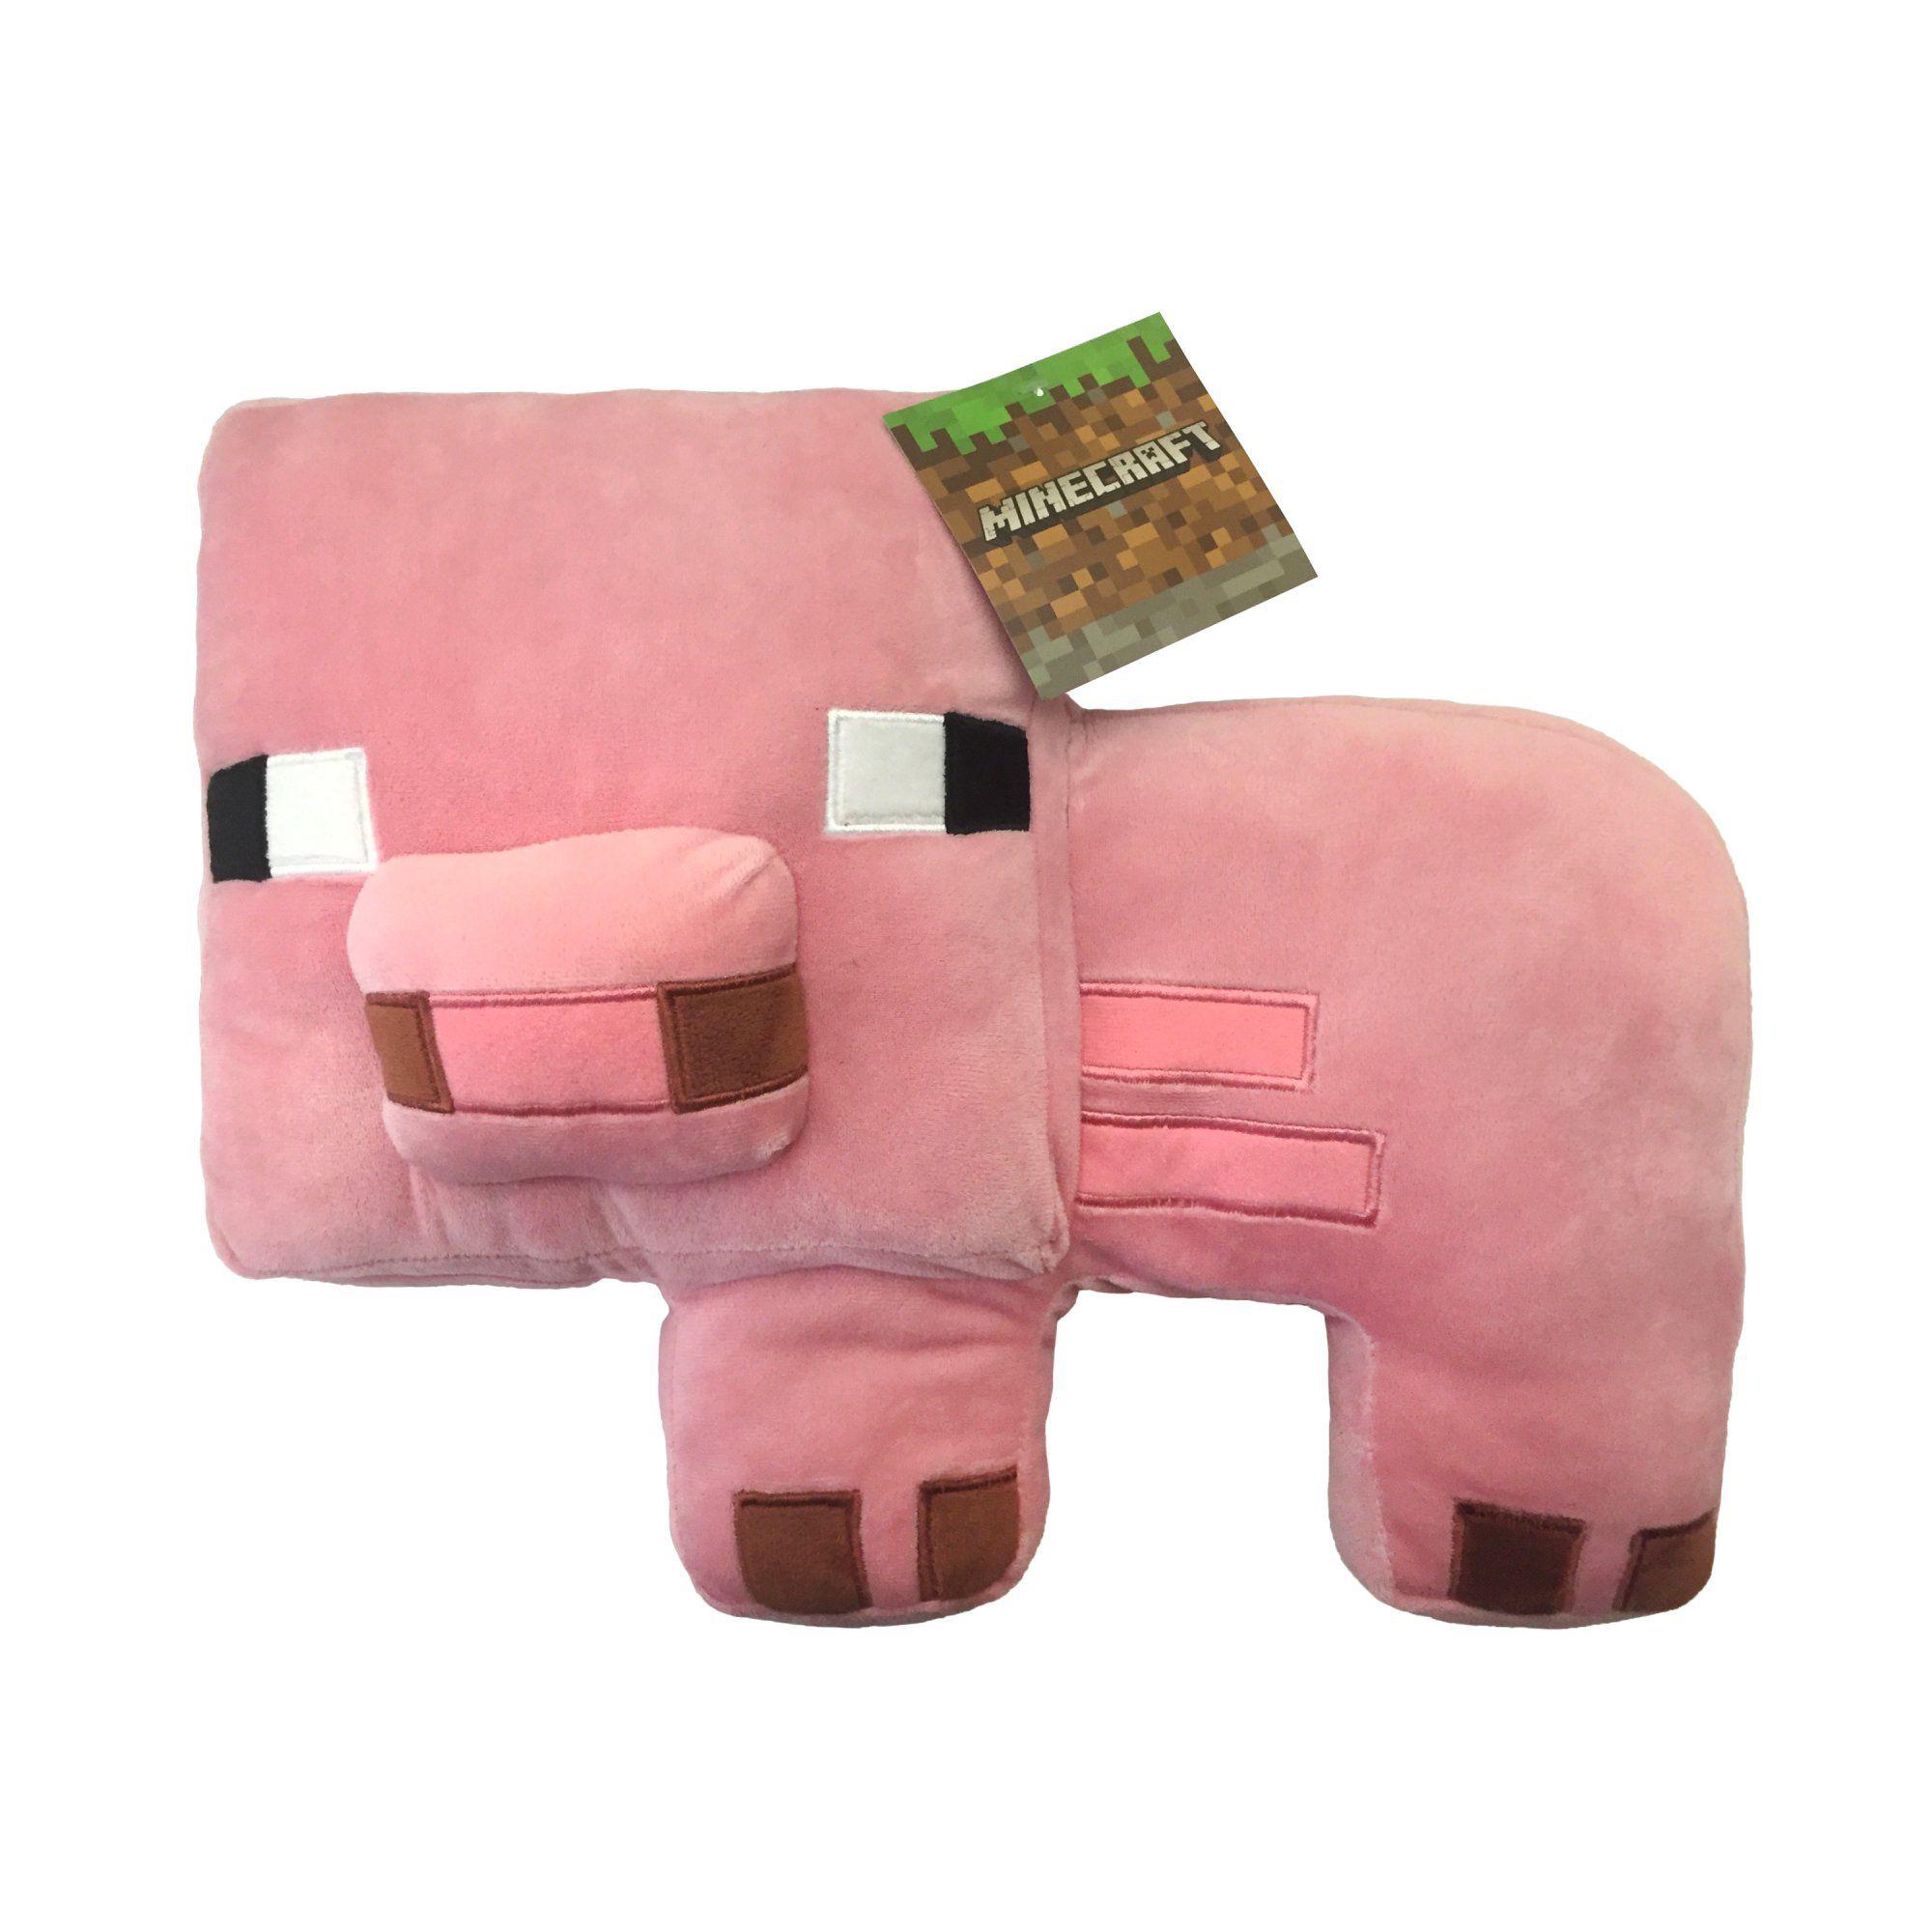 Baby Plush dolls, Pillow pals, Pillows